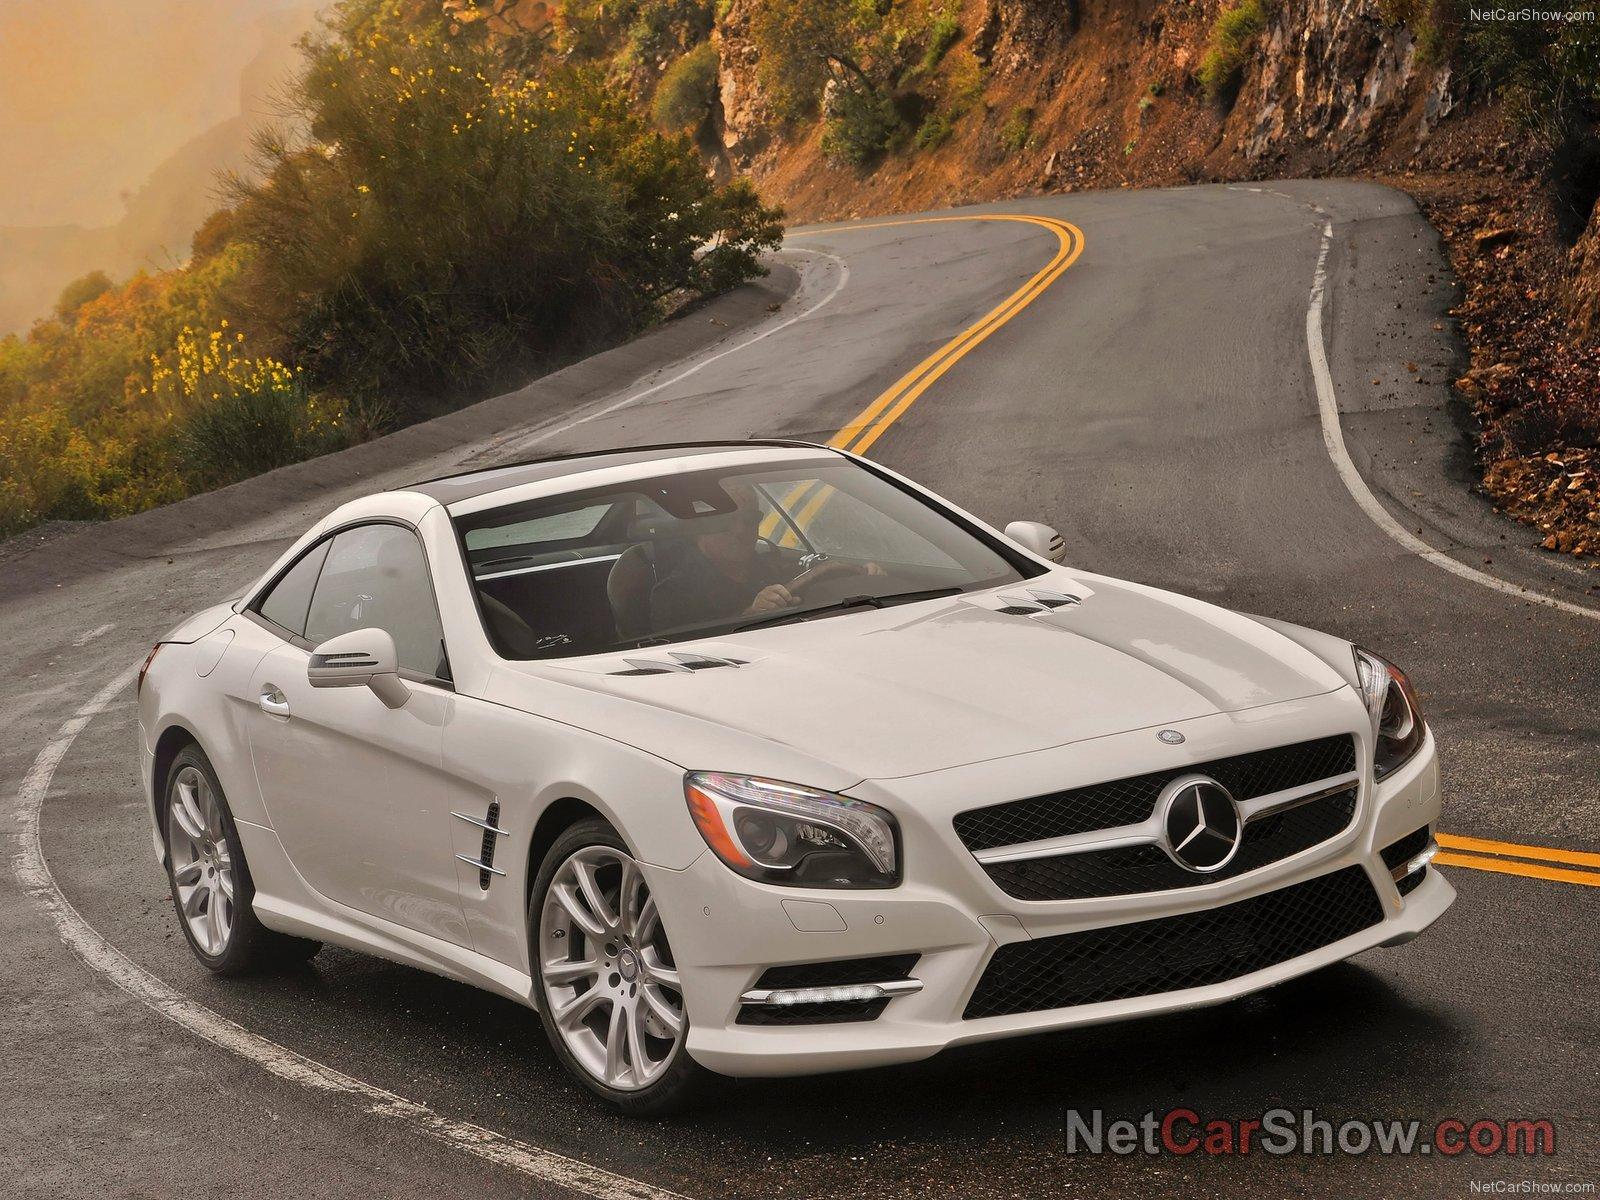 Mercedes benz sl550 picture 91295 mercedes benz photo for Mercedes benz sl550